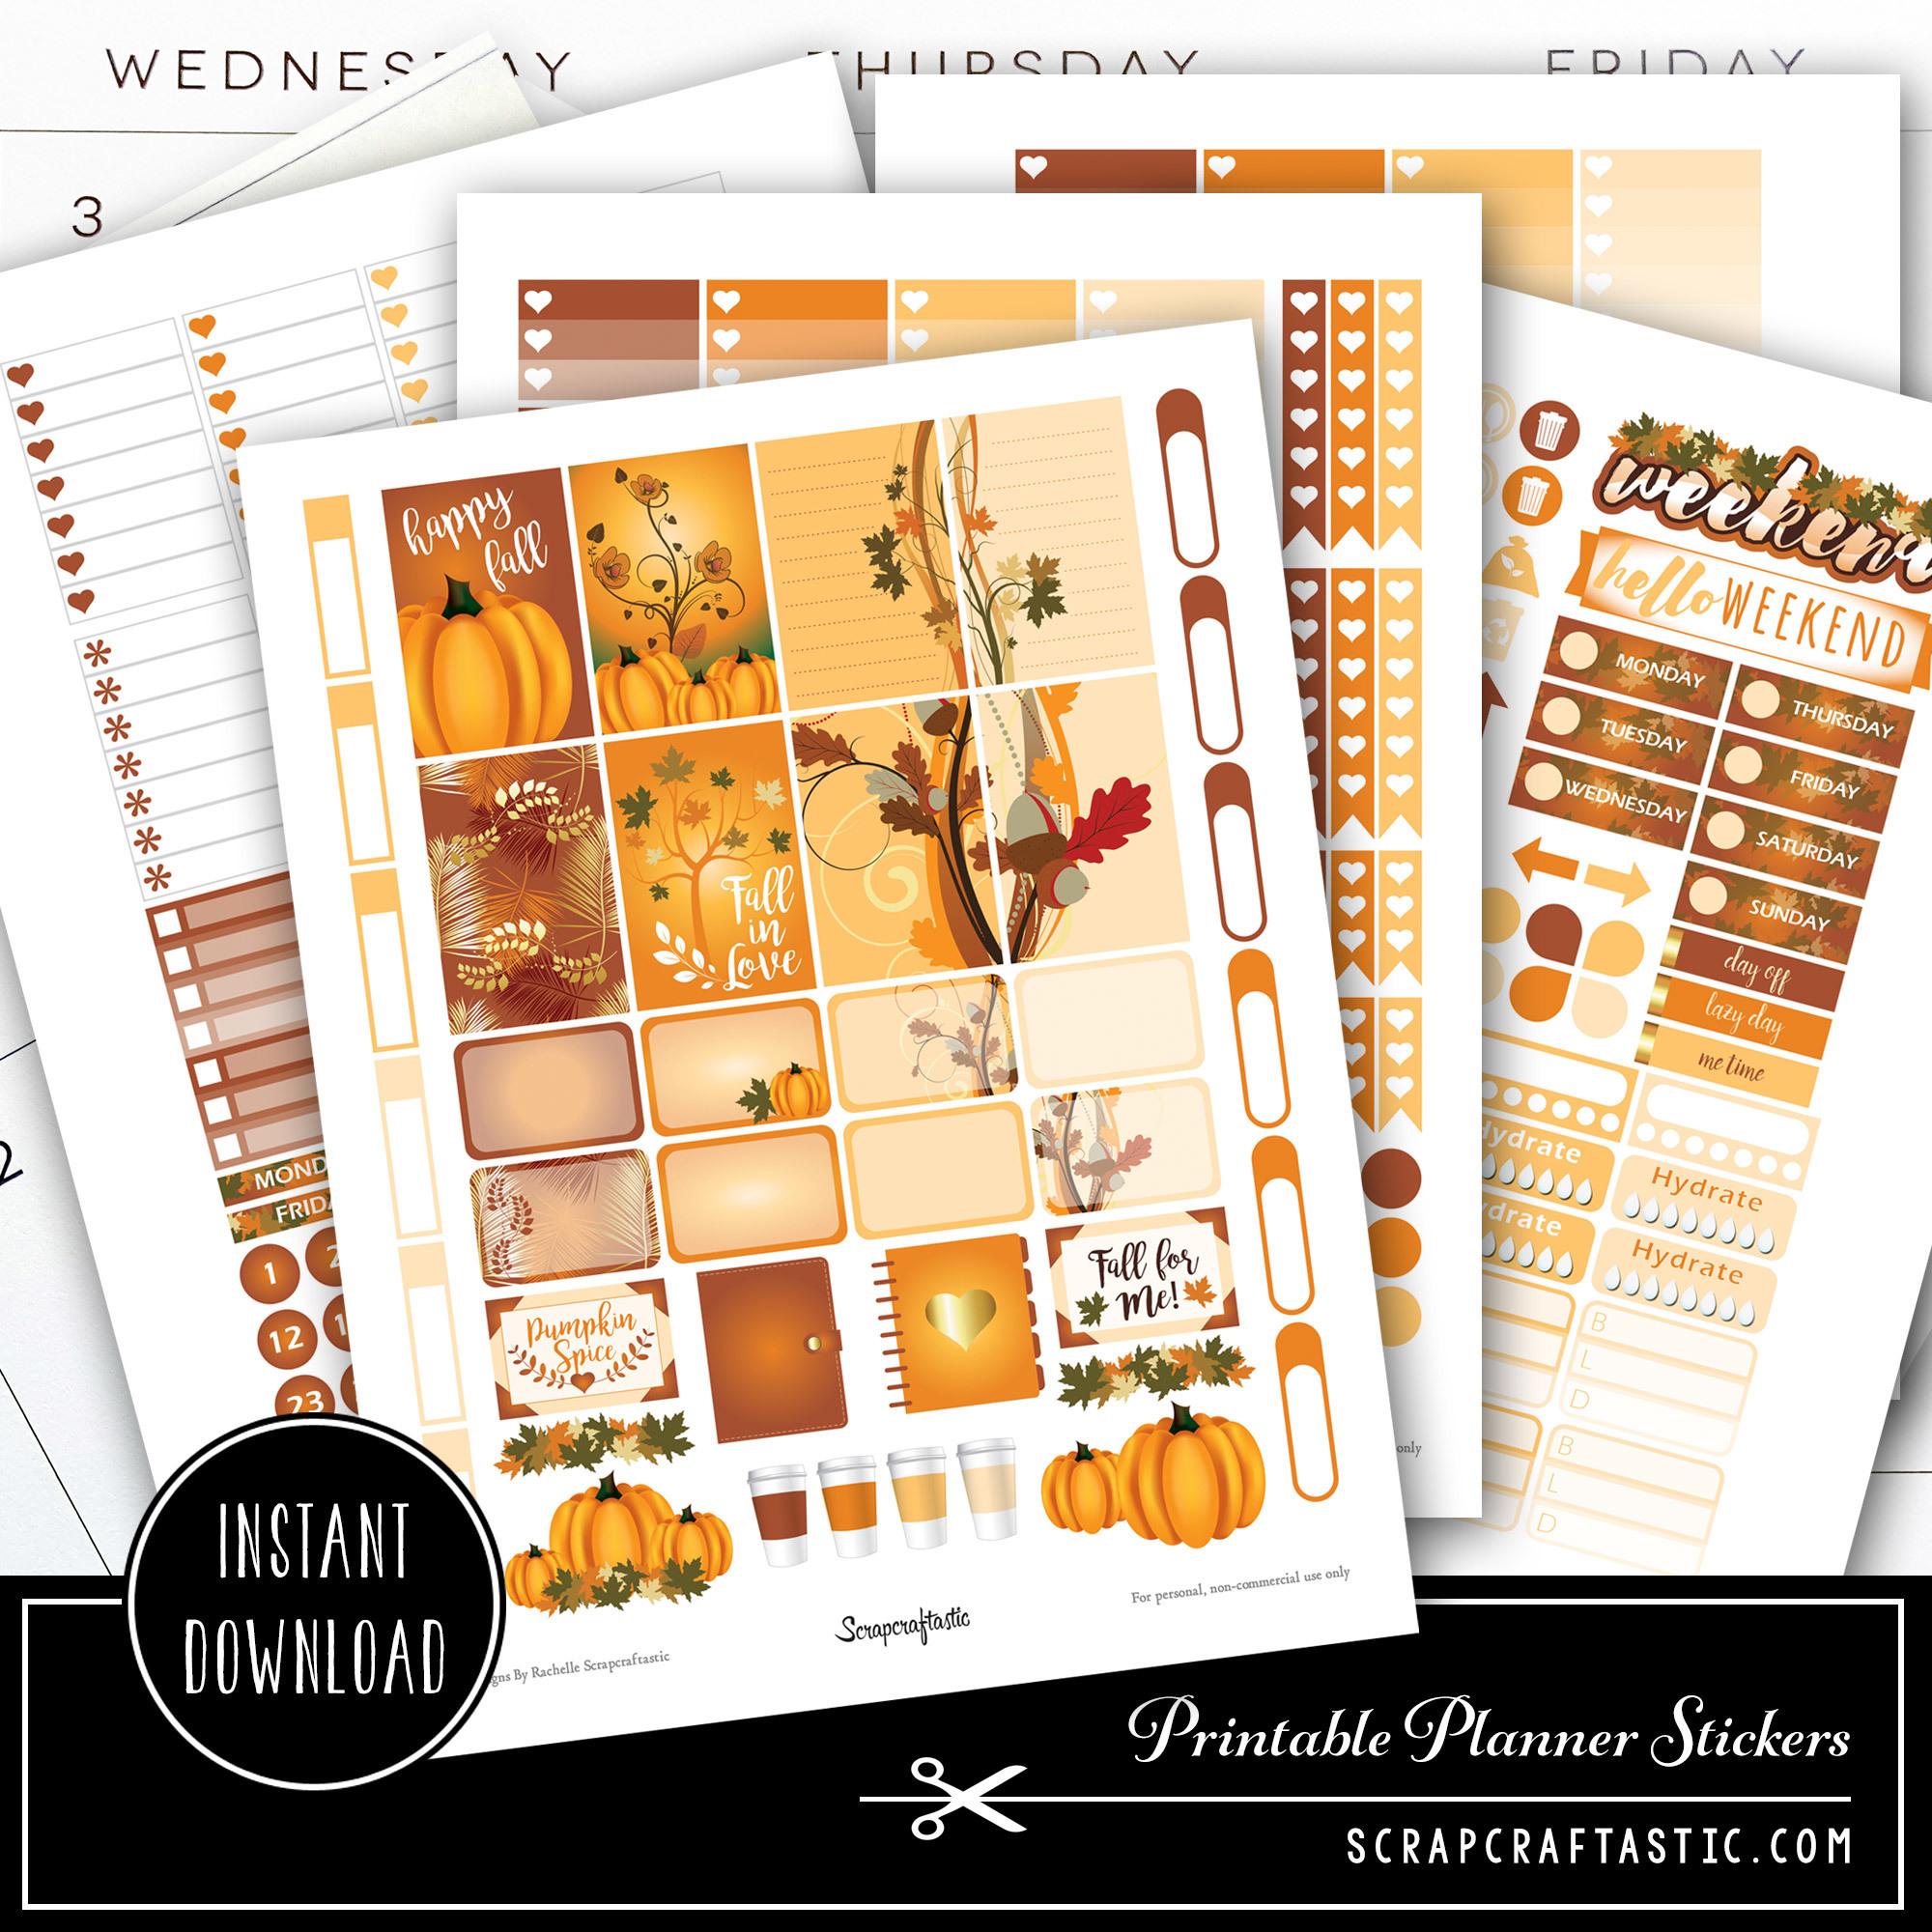 Pumpkin Spice Printable Planner Stickers 01001